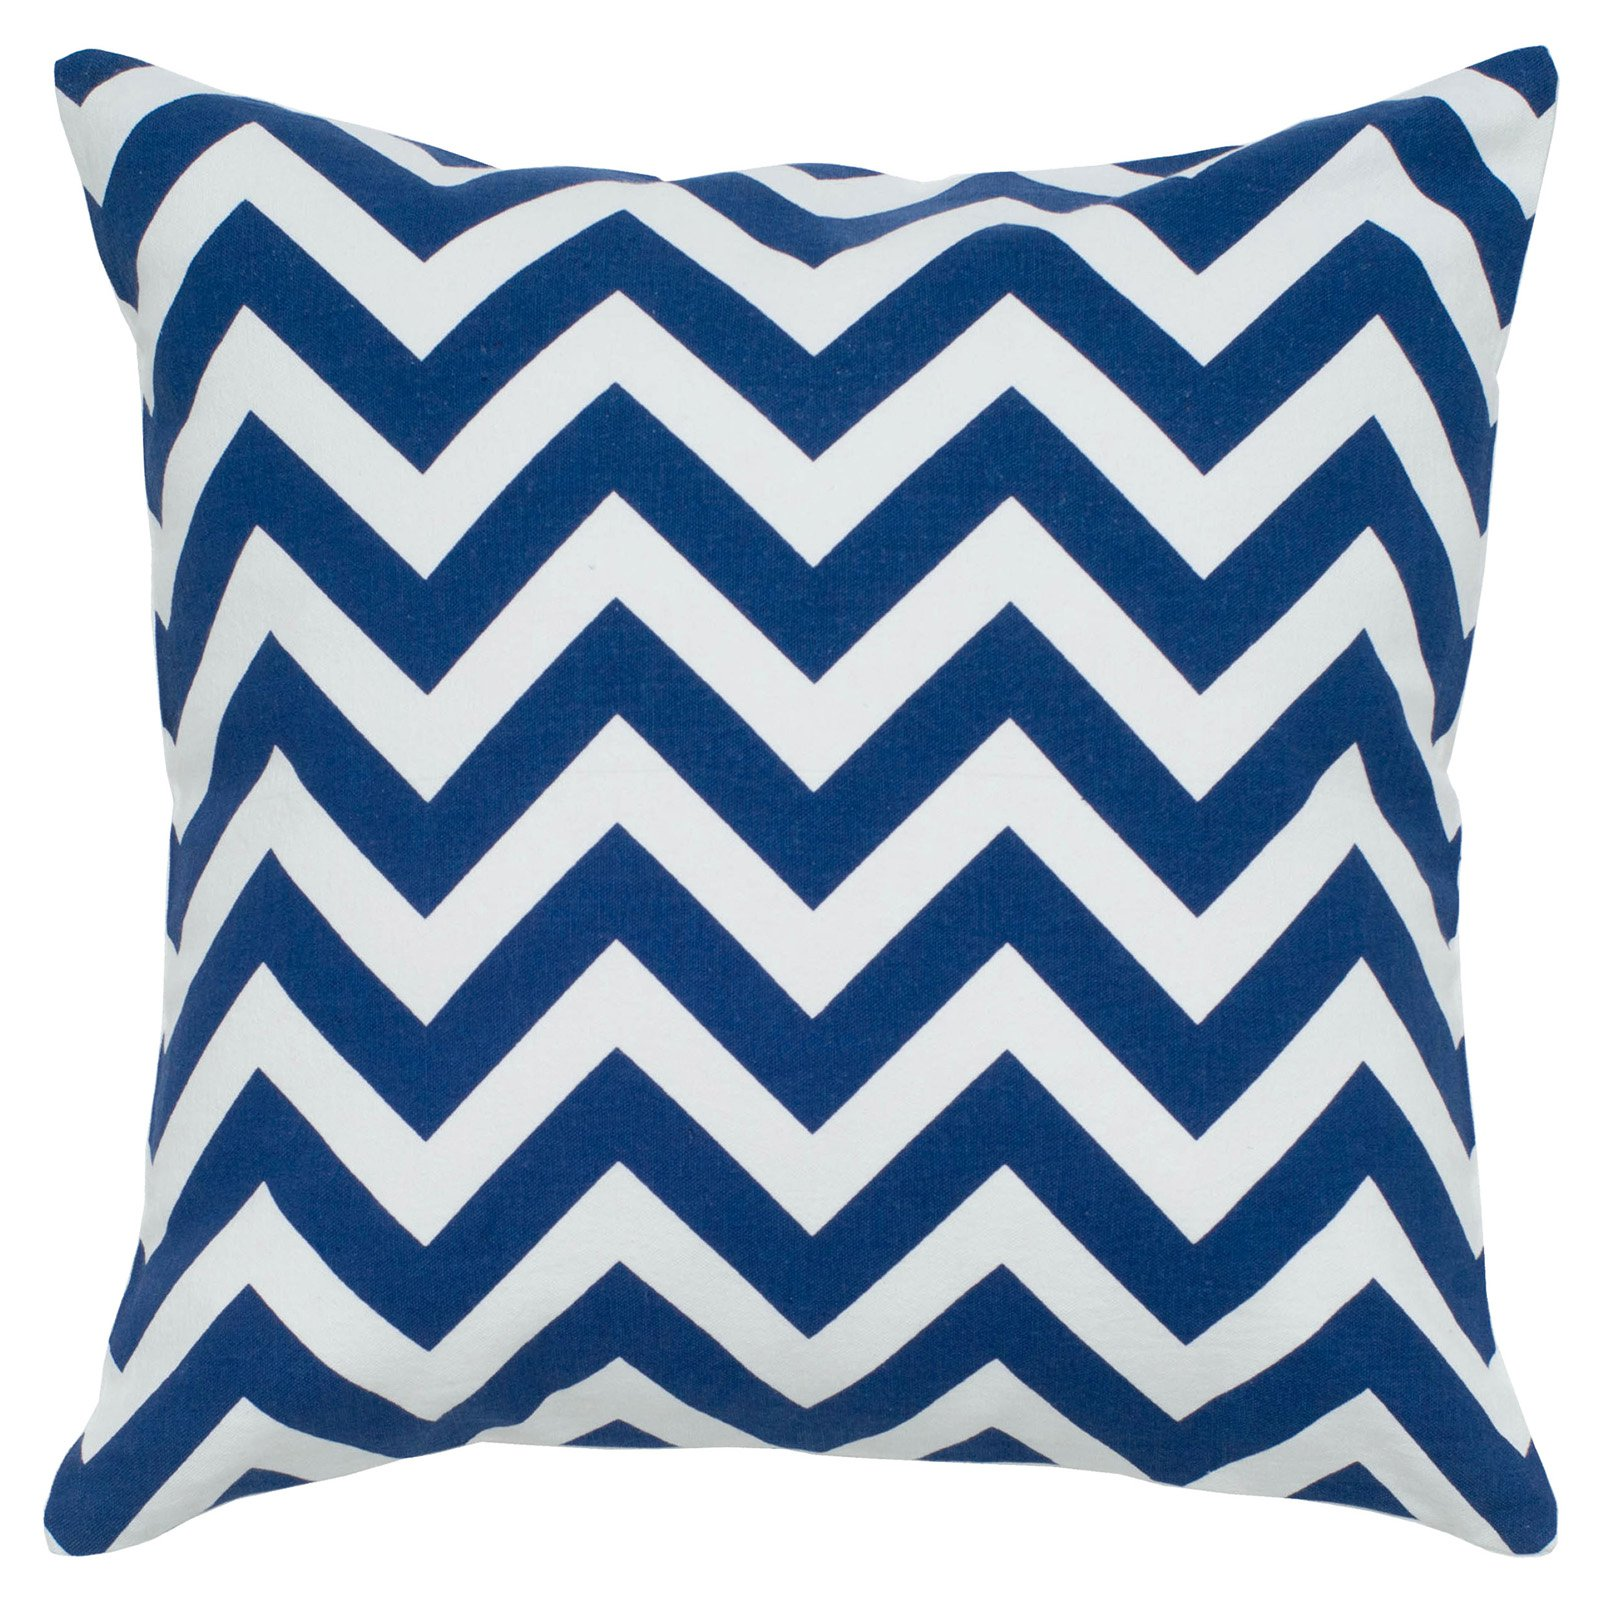 "Rizzy Home chevron18"" x 18""Cotton decorative filled pillow"